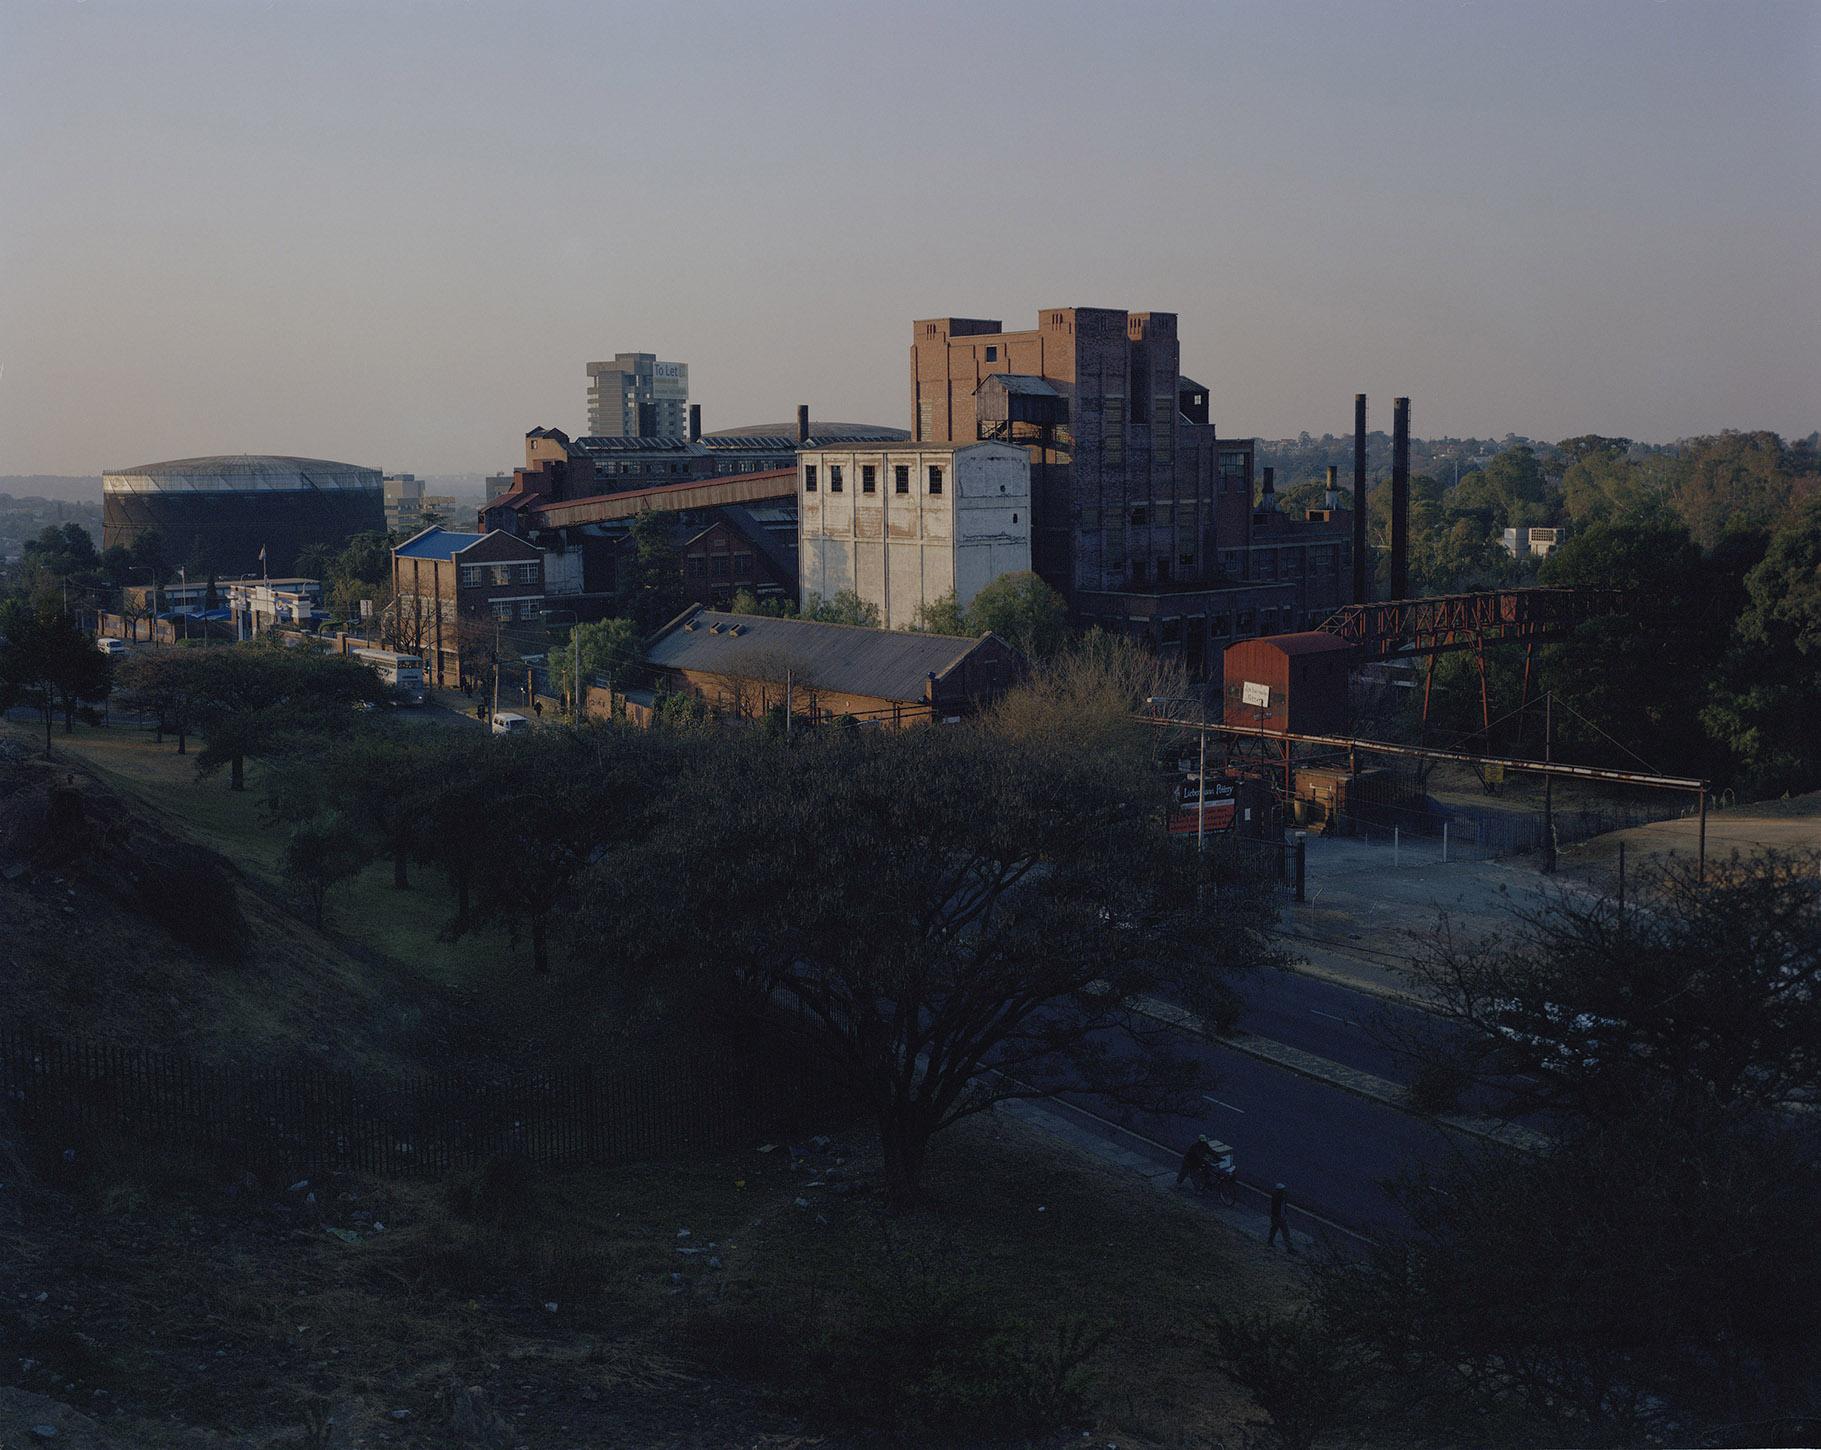 Gas Works 1/24, Johannesburg, 2016